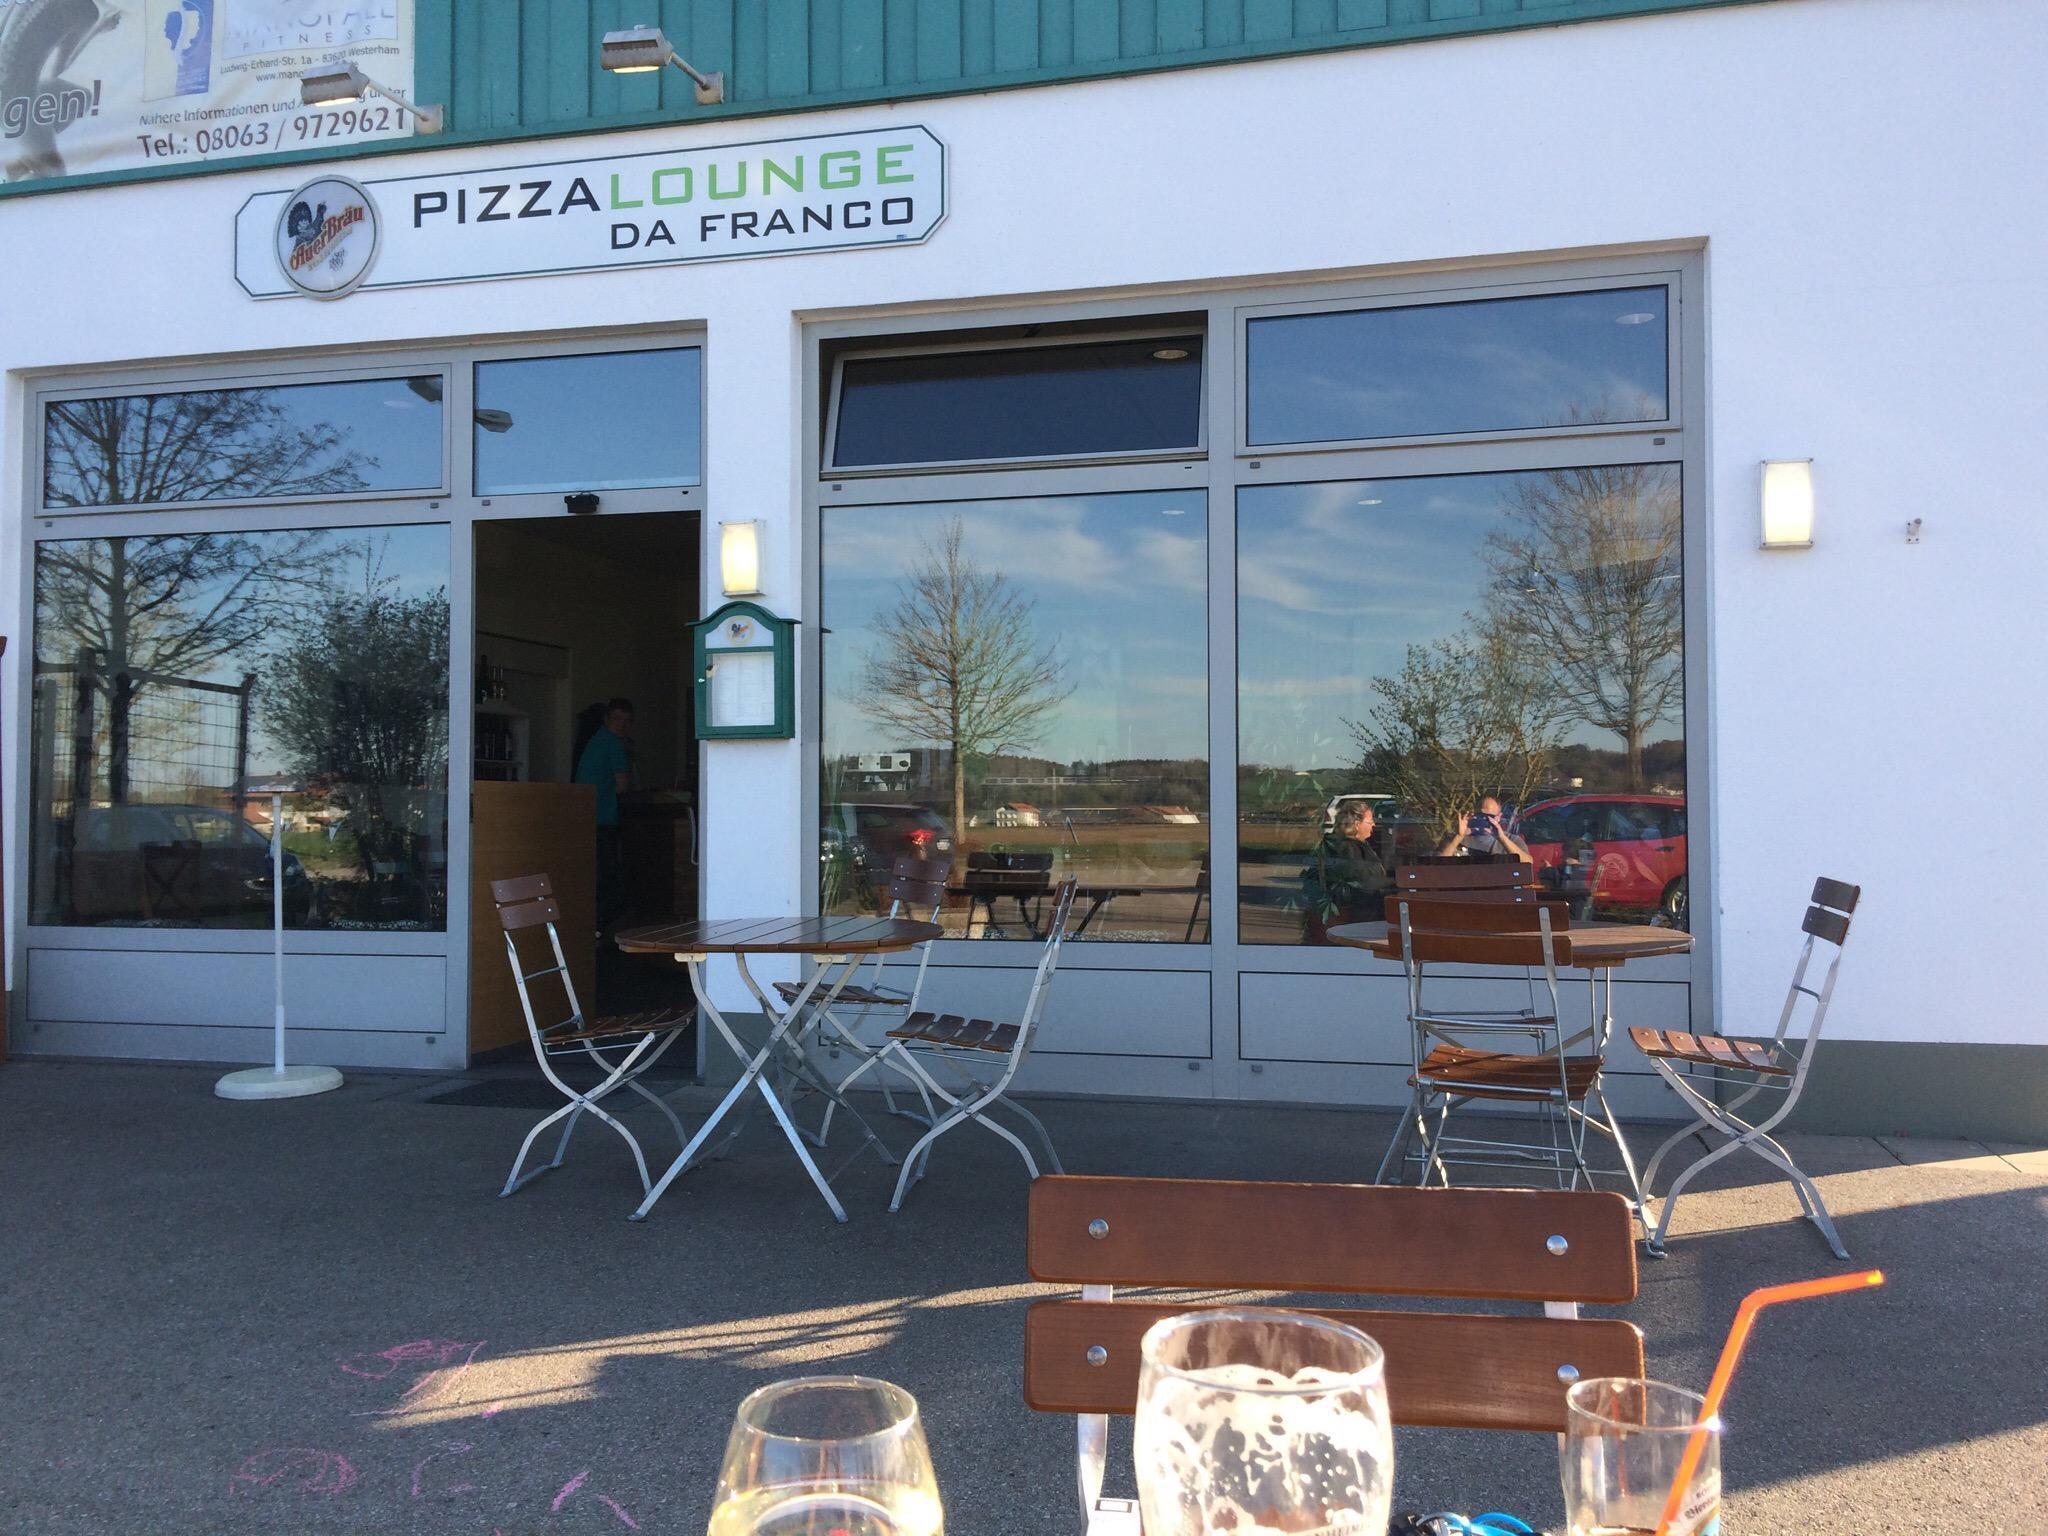 Best Italian food near Weyarn, Bavaria, Germany